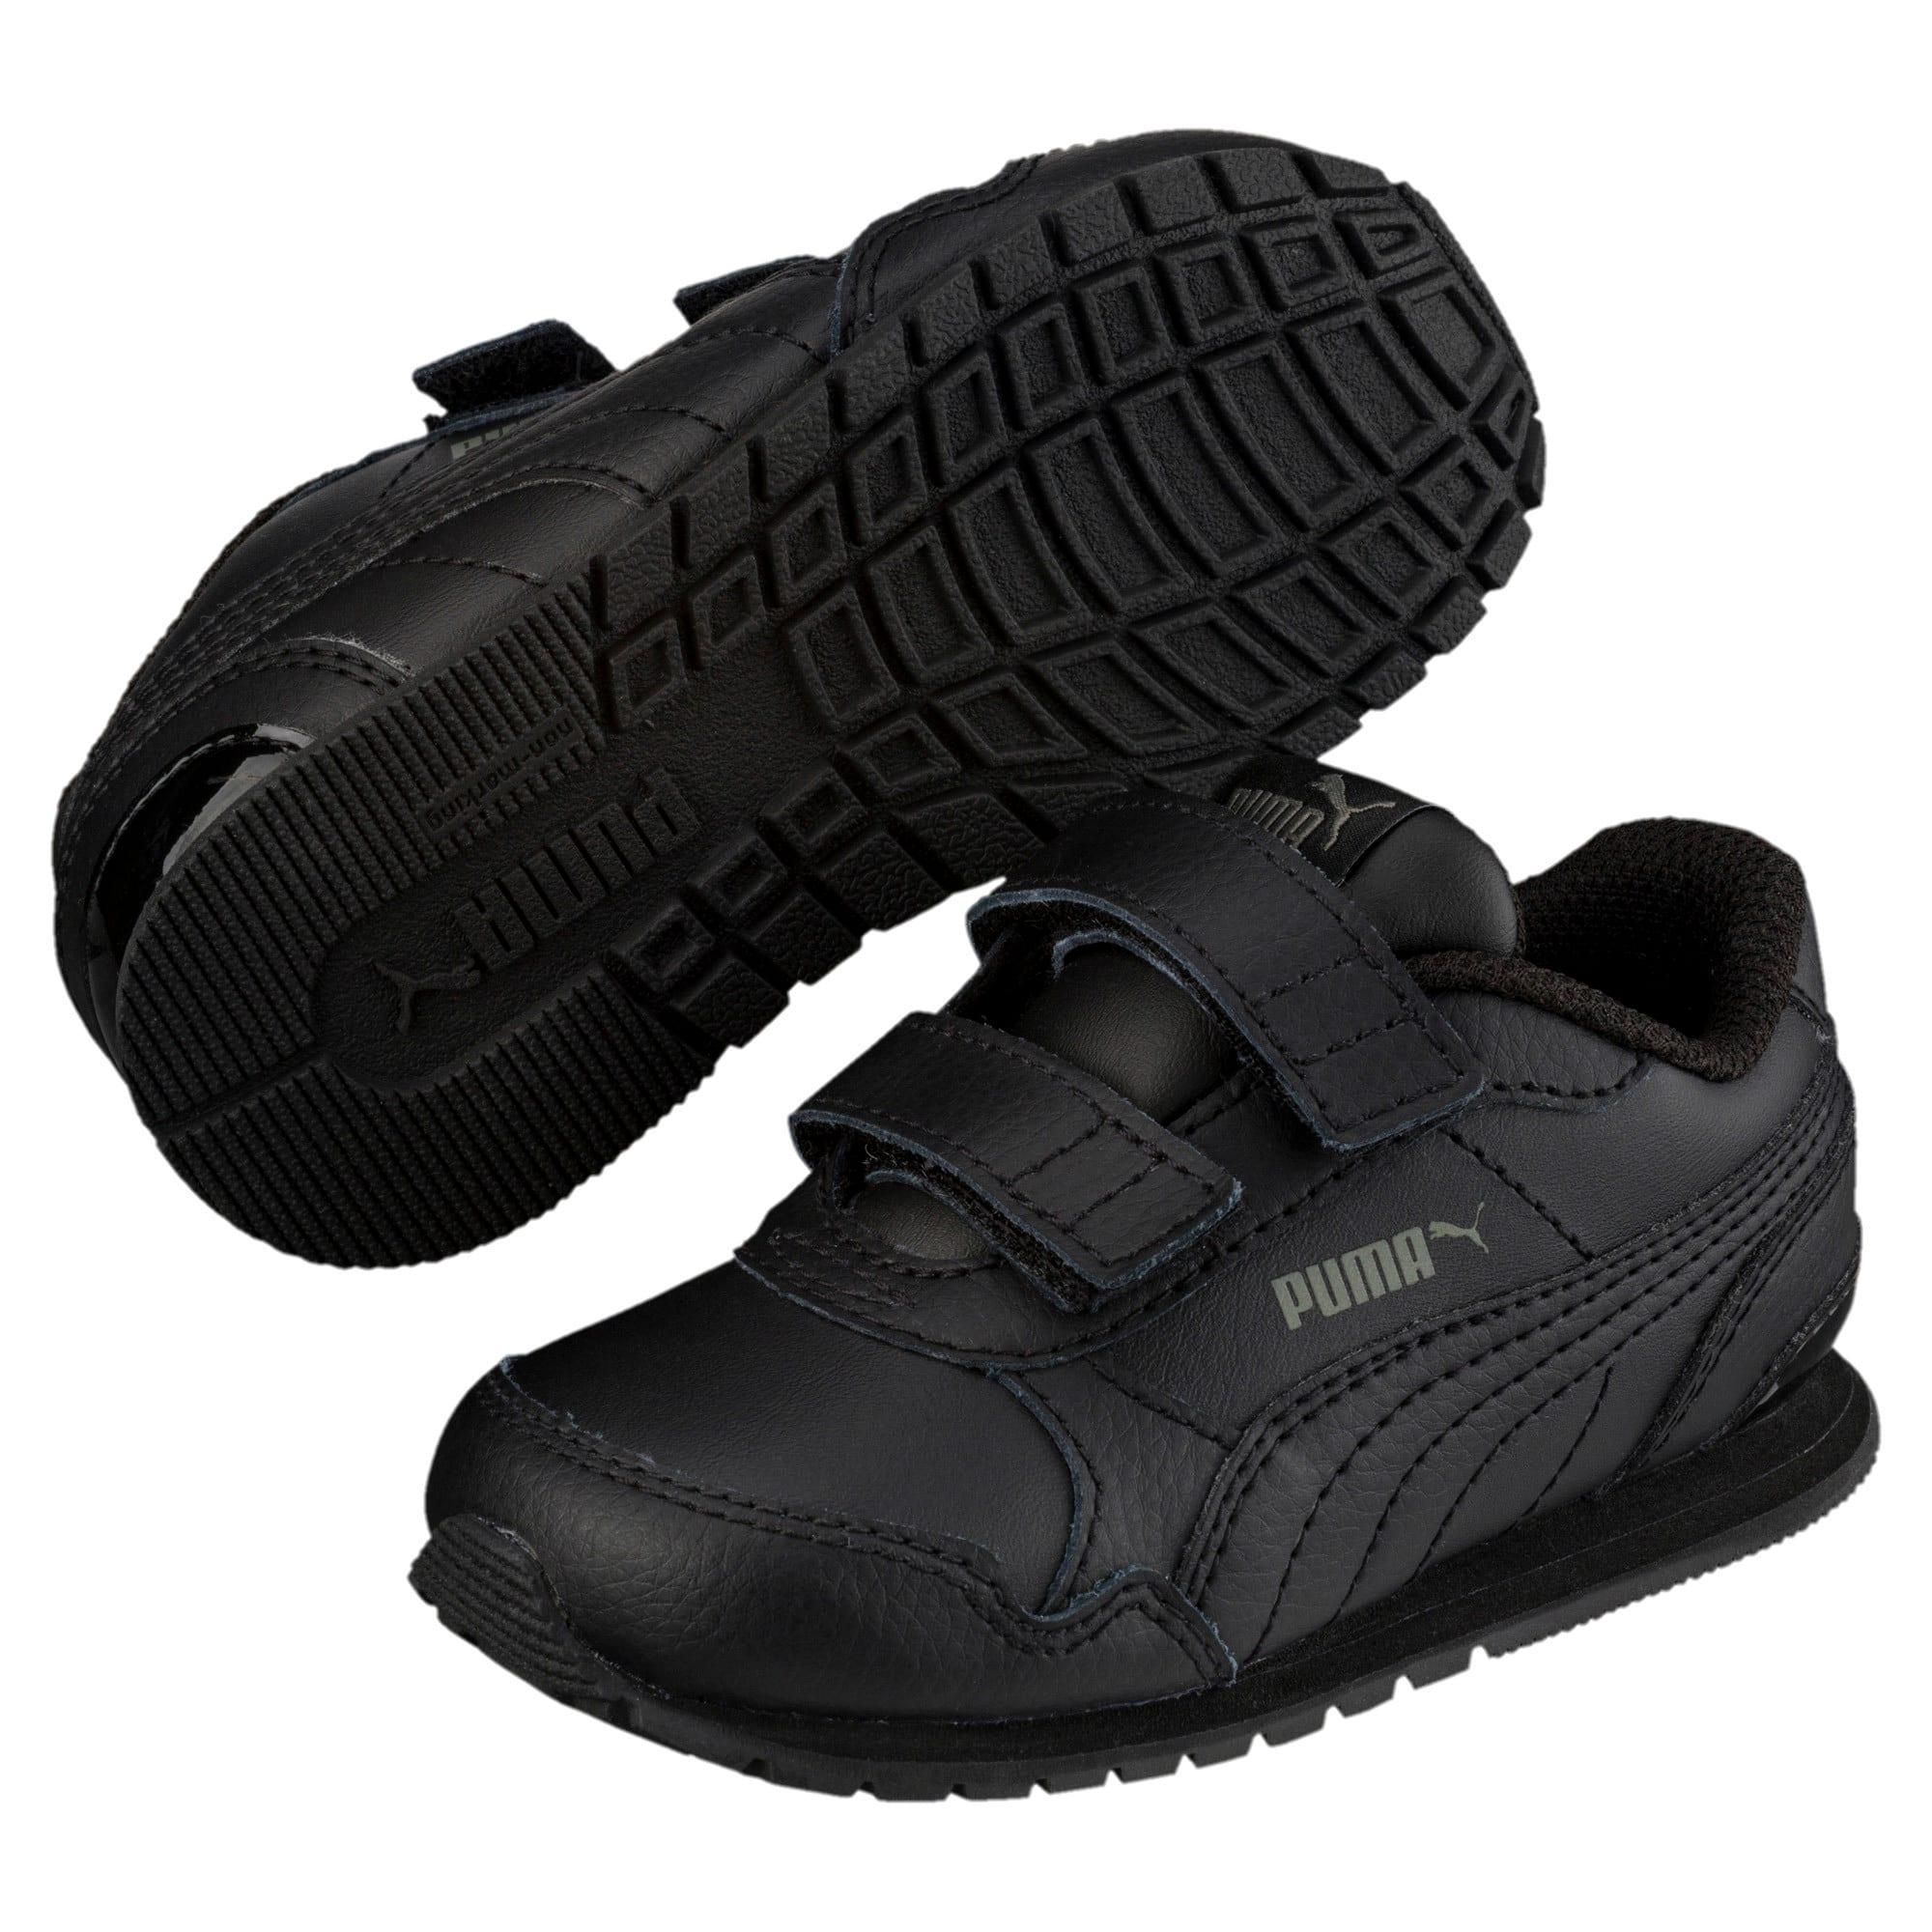 Thumbnail 1 of ST Runner v2 AC Shoes INF, Puma Black-Dark Shadow, medium